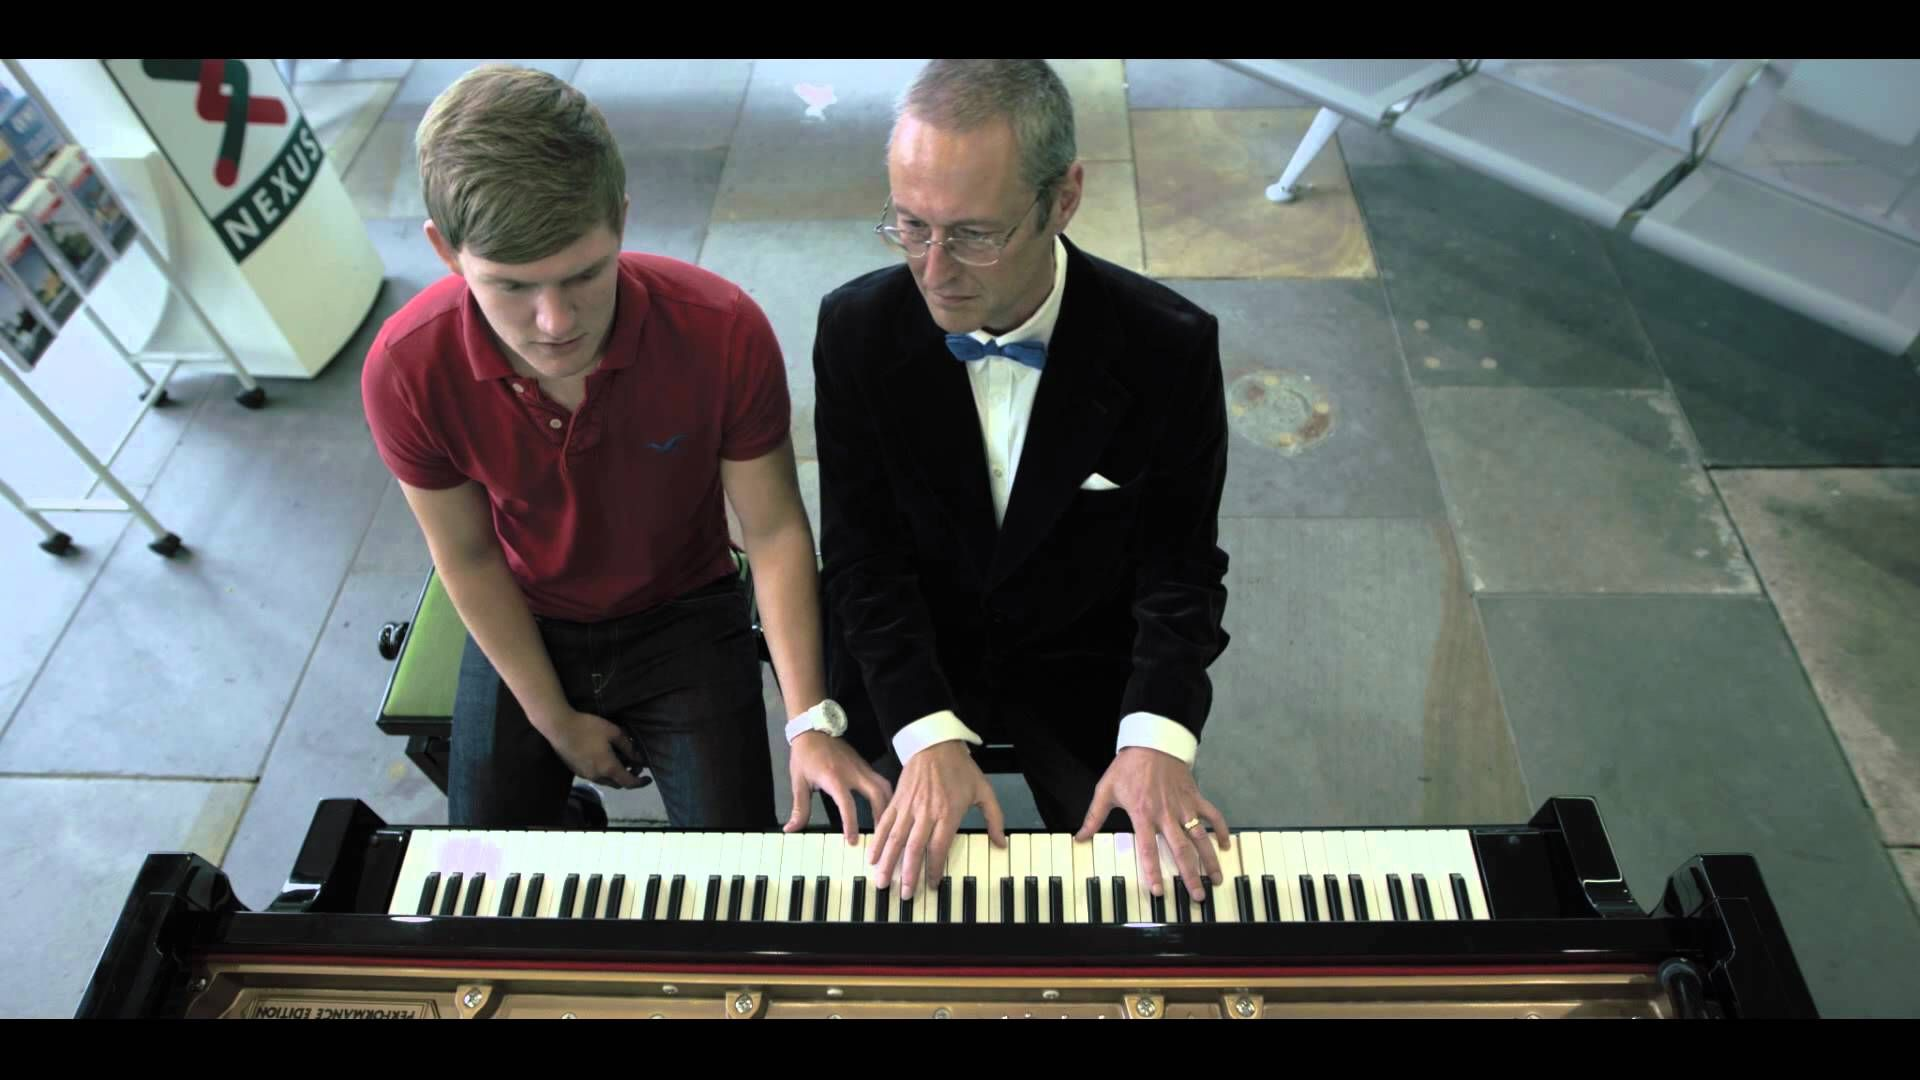 Pin On Piano Sonata No 14 In G Minor And More